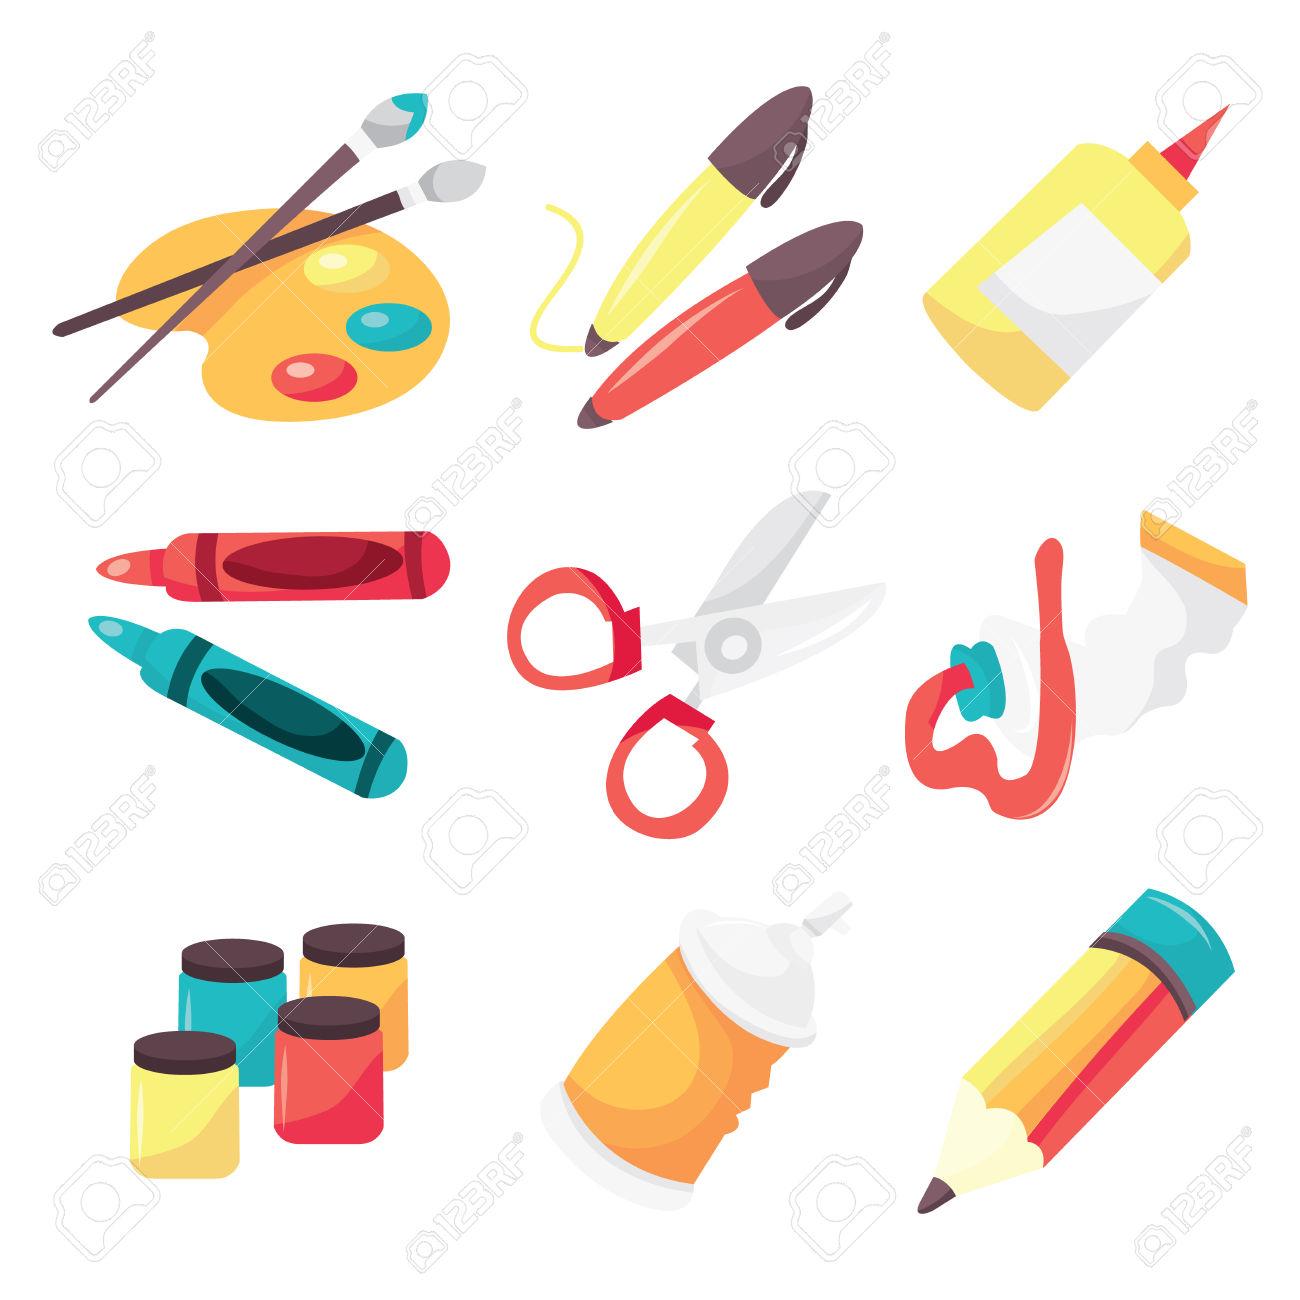 A Vector Illustration Icon Set Of Art Supplies Like Paintbrush.